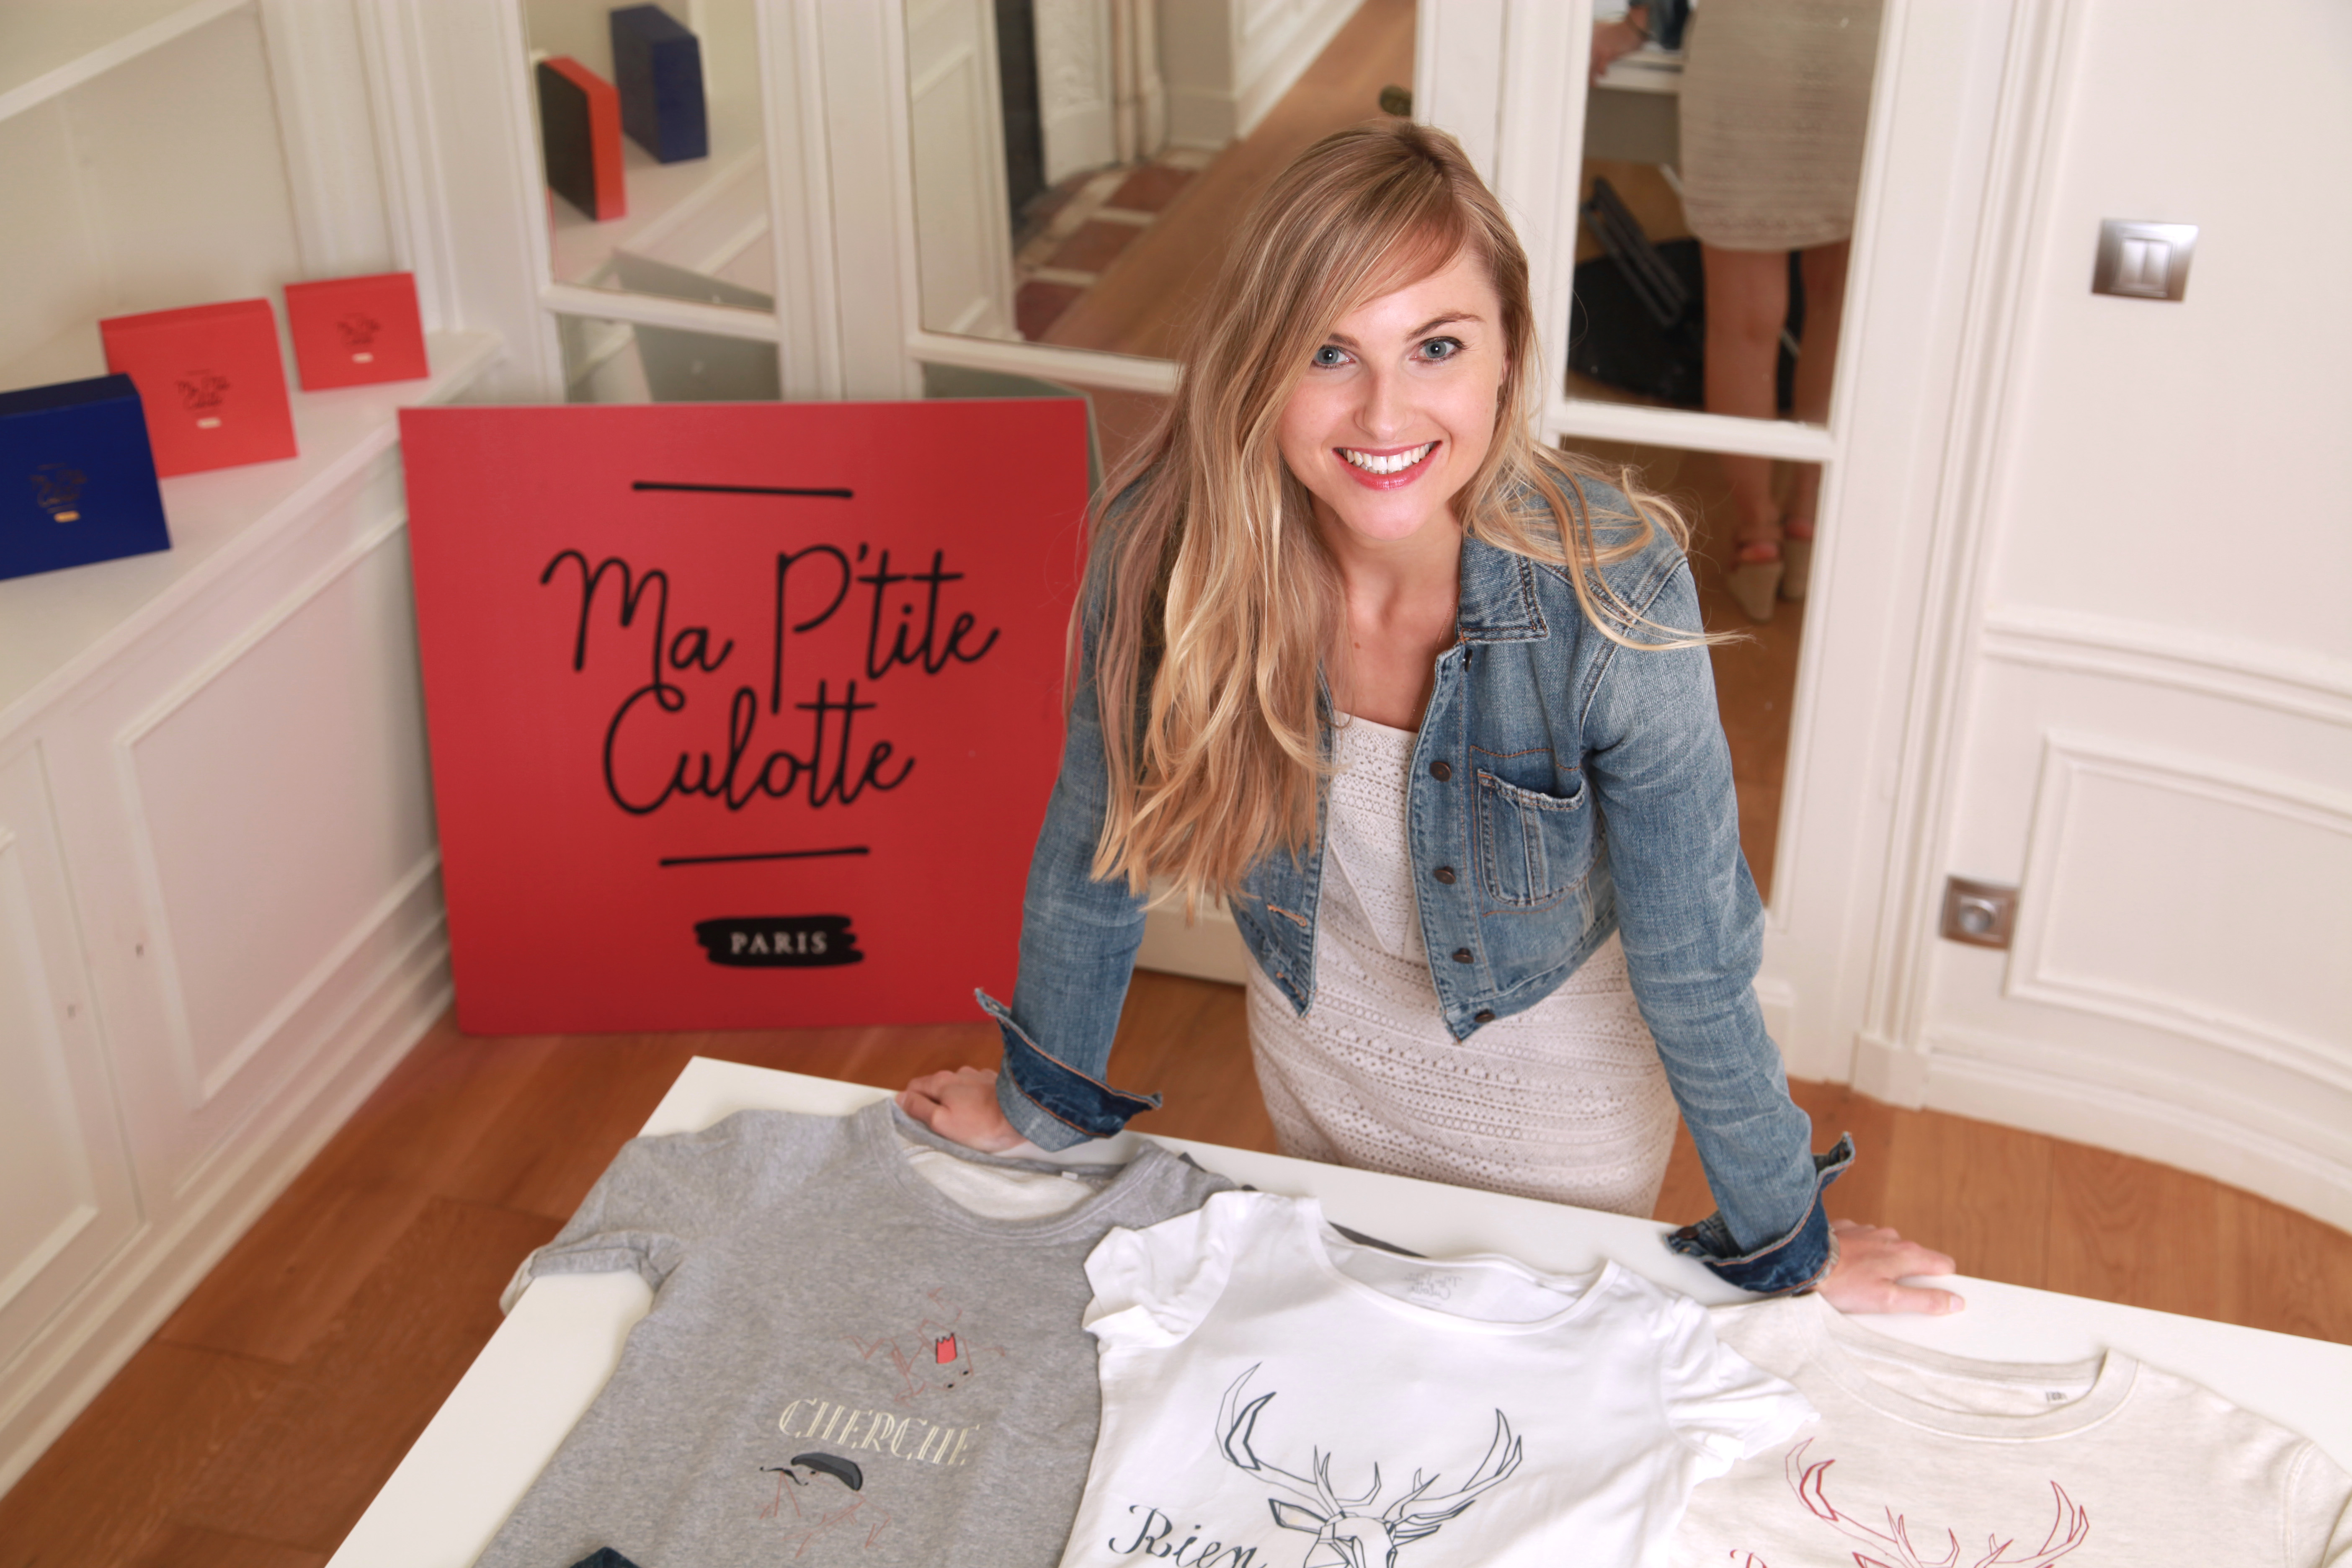 Inspirante : A 25 ans, elle a fondé sa marque de lingerie